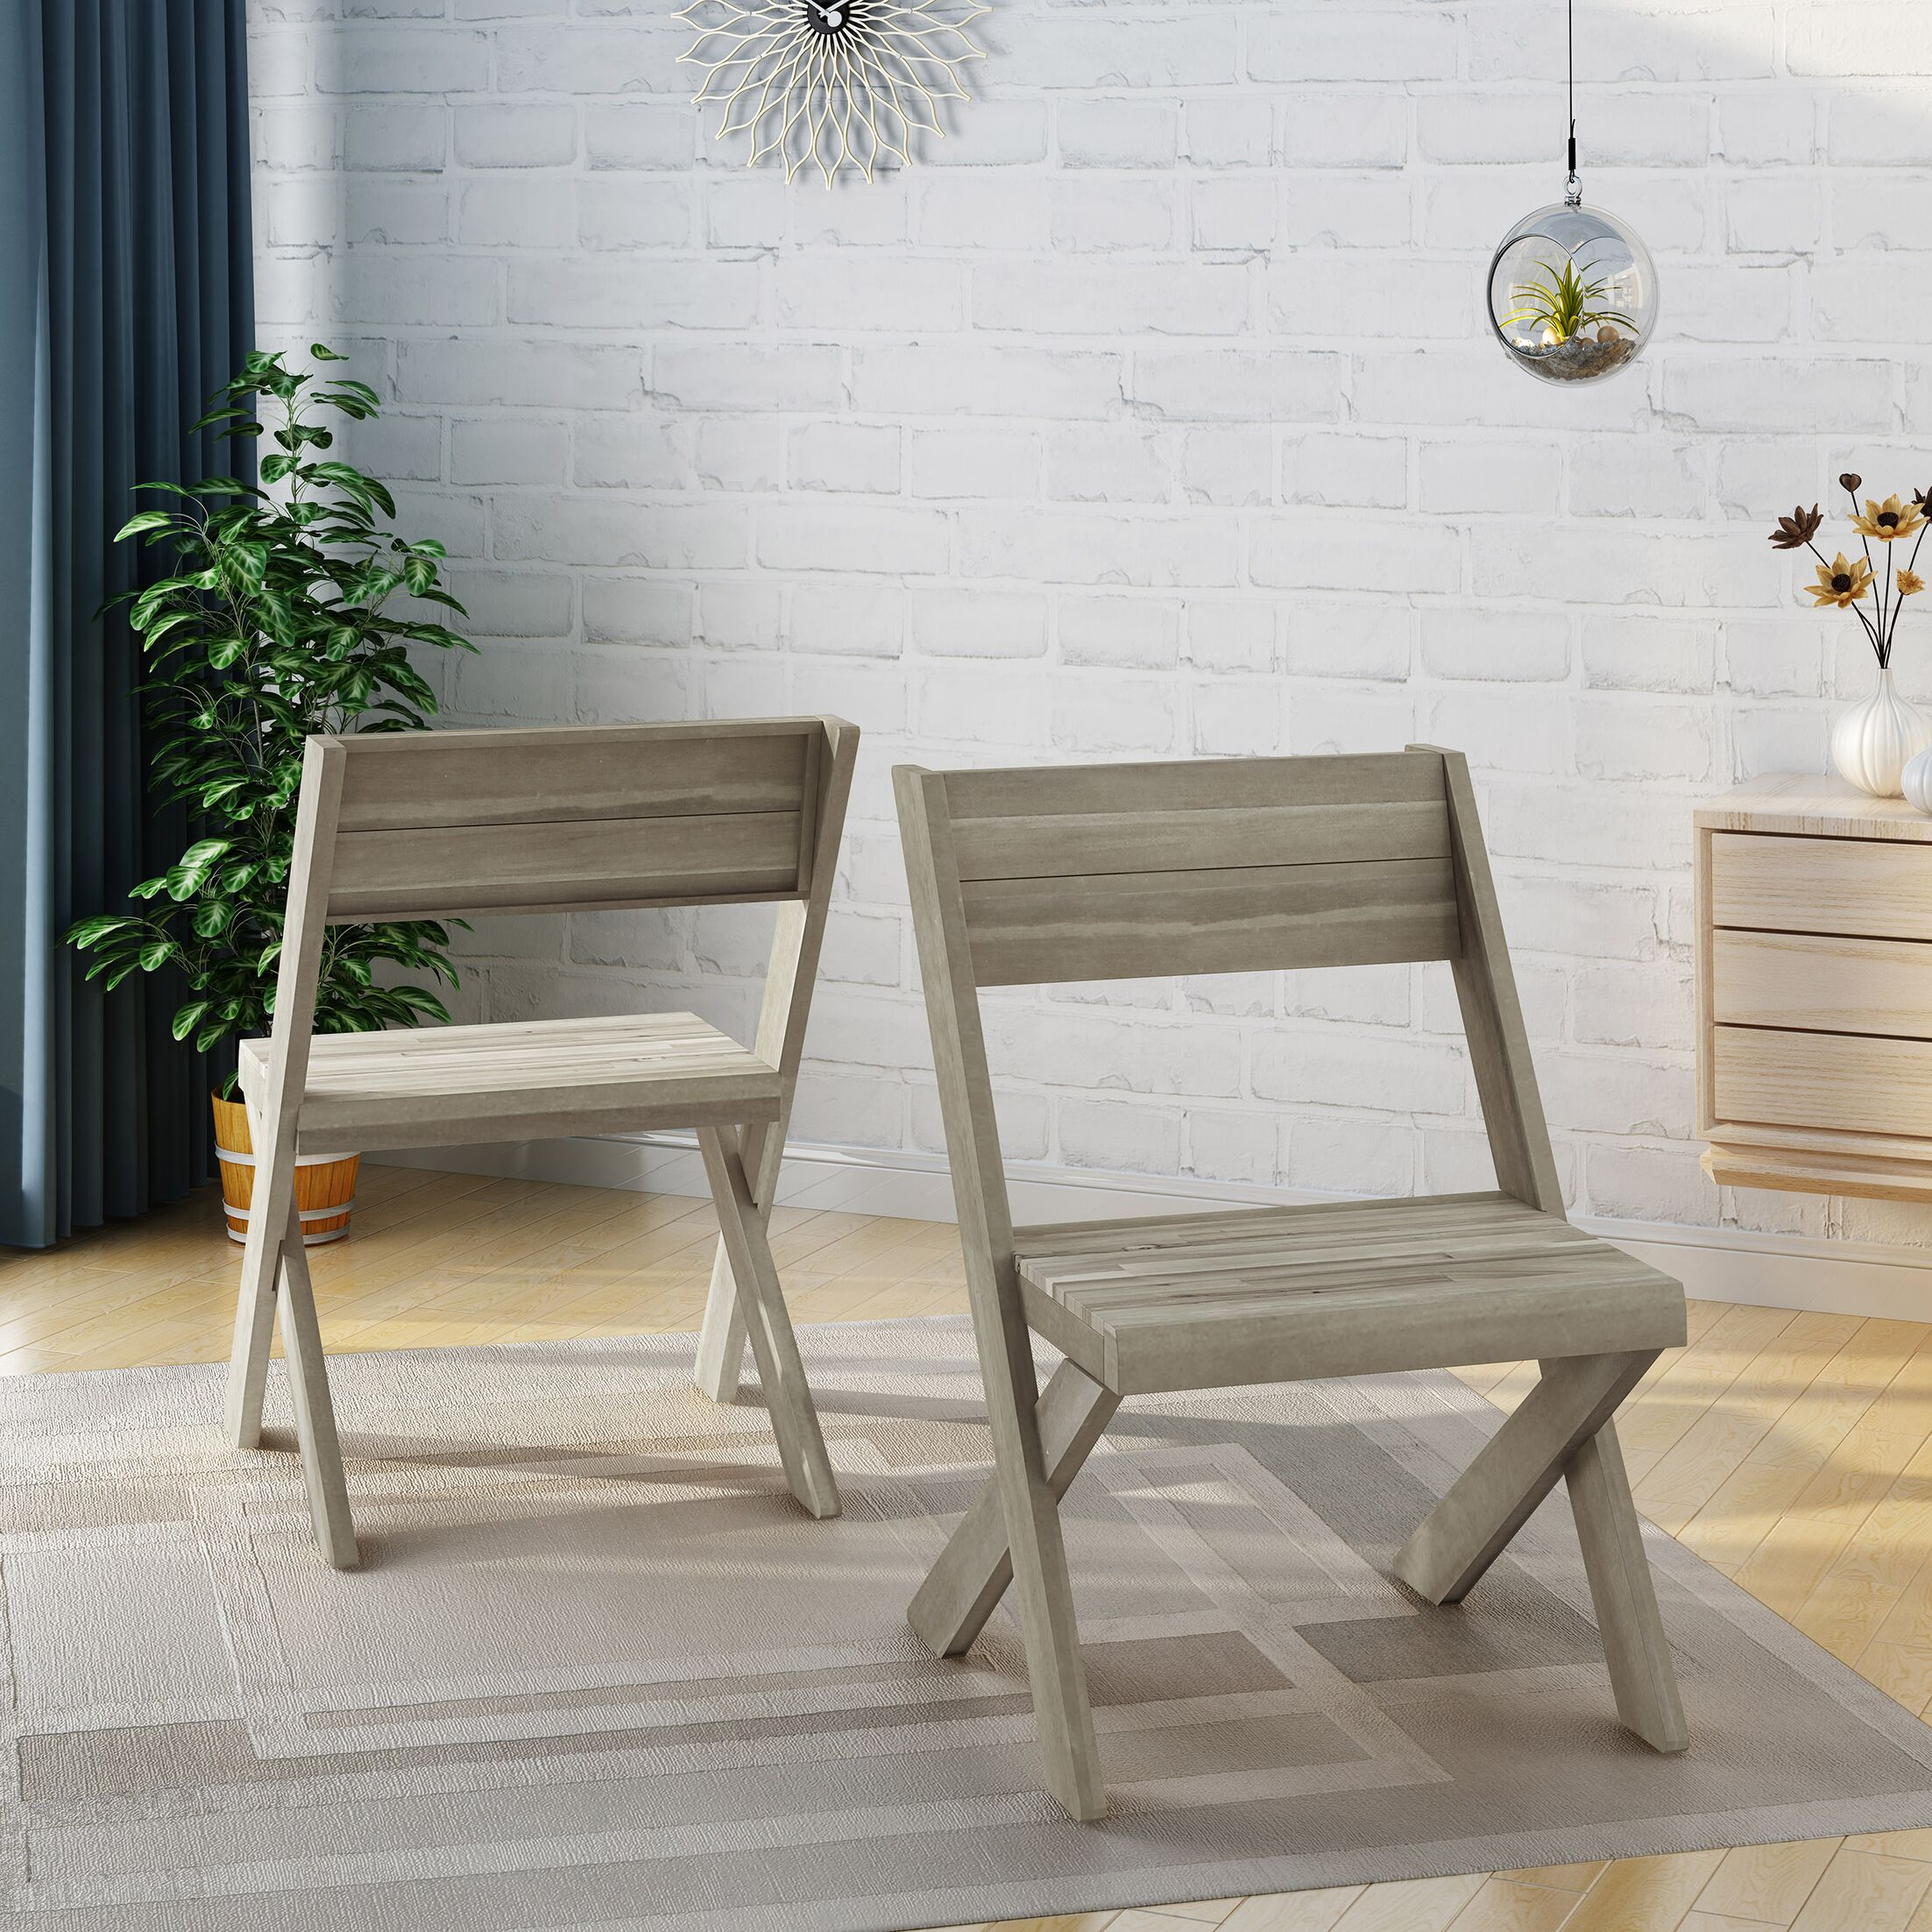 Indoor Farmhouse Solid Wood Dining Chair Color: Sandblast Light Gray